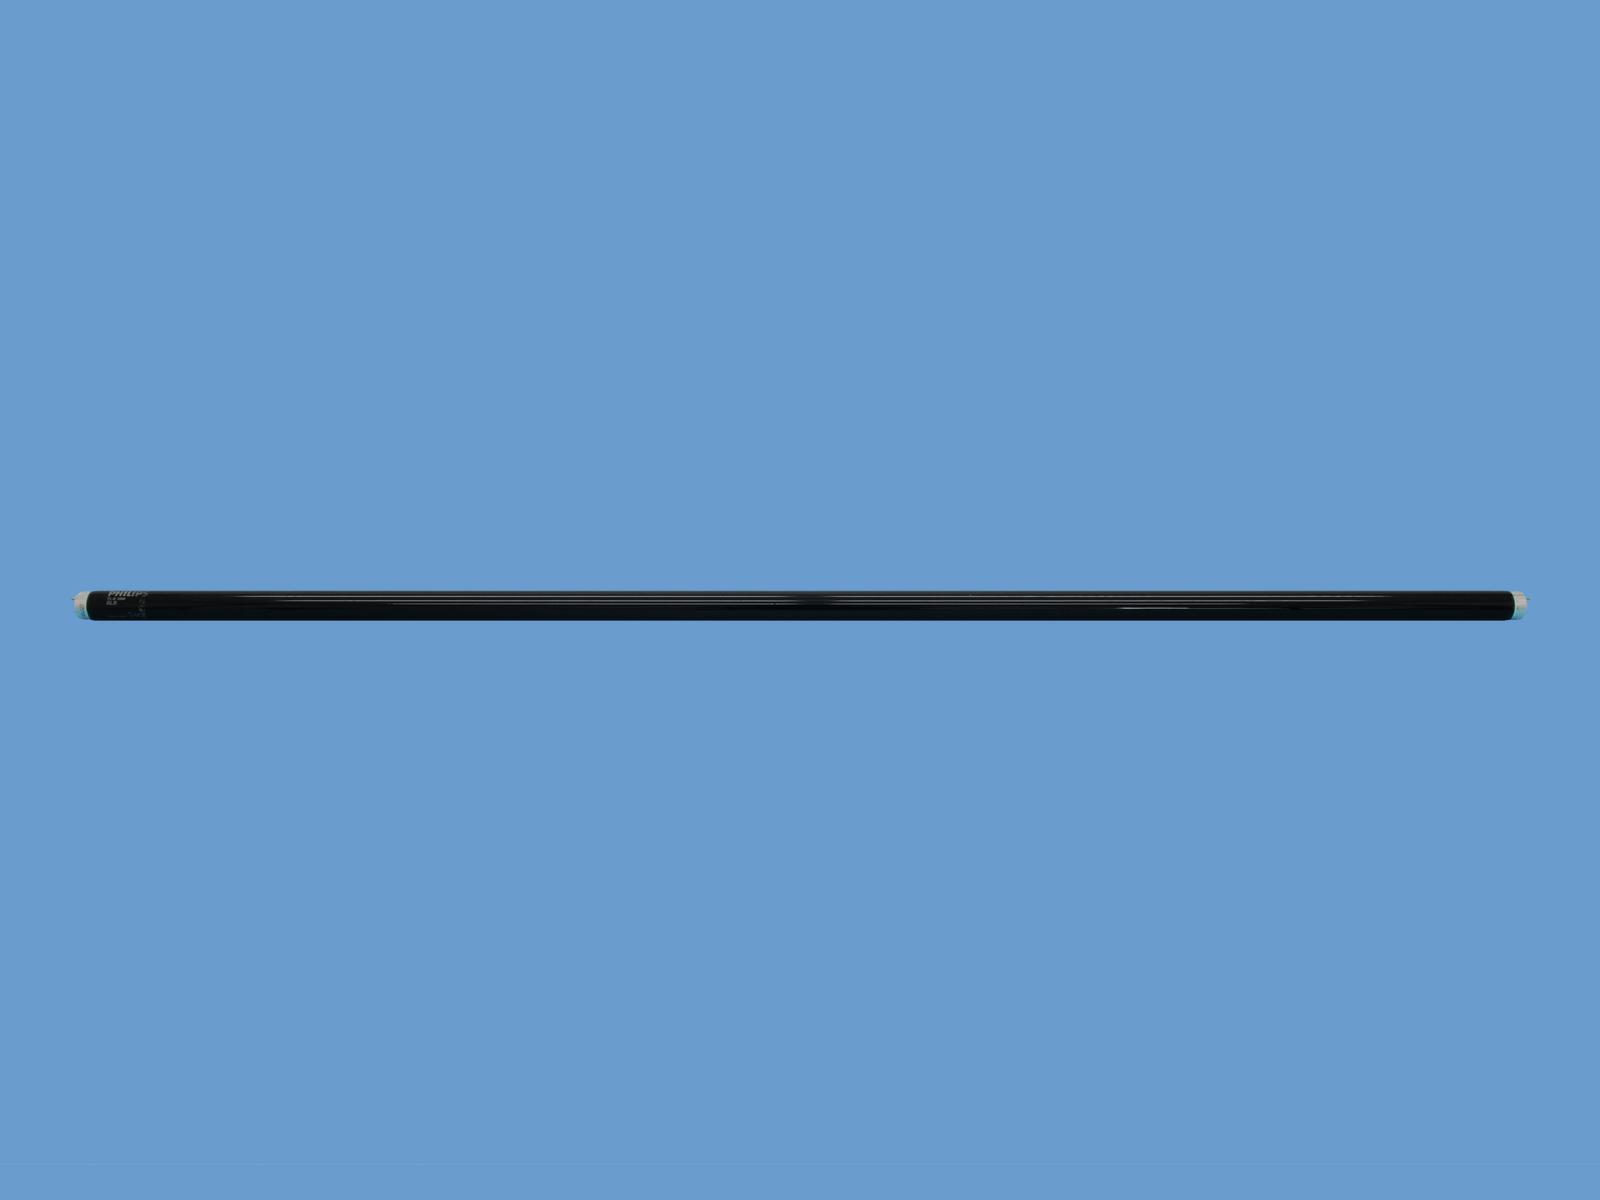 PHILIPS tubo UV slim line 36W 120cm